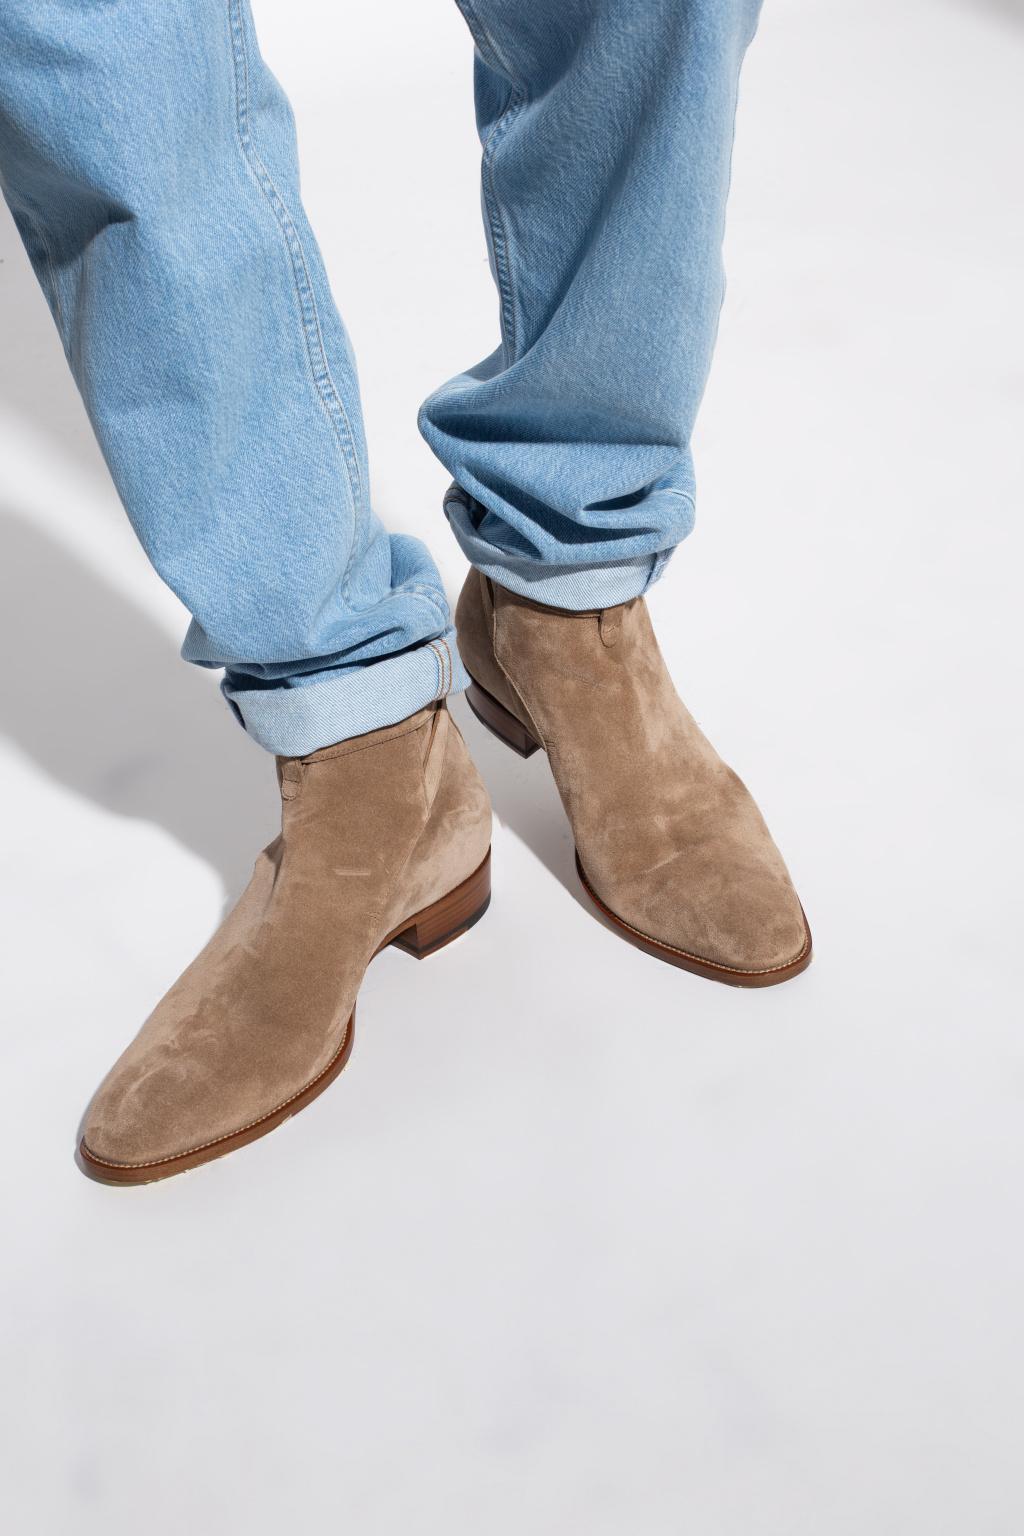 Saint Laurent 'Wyatt' leather boots